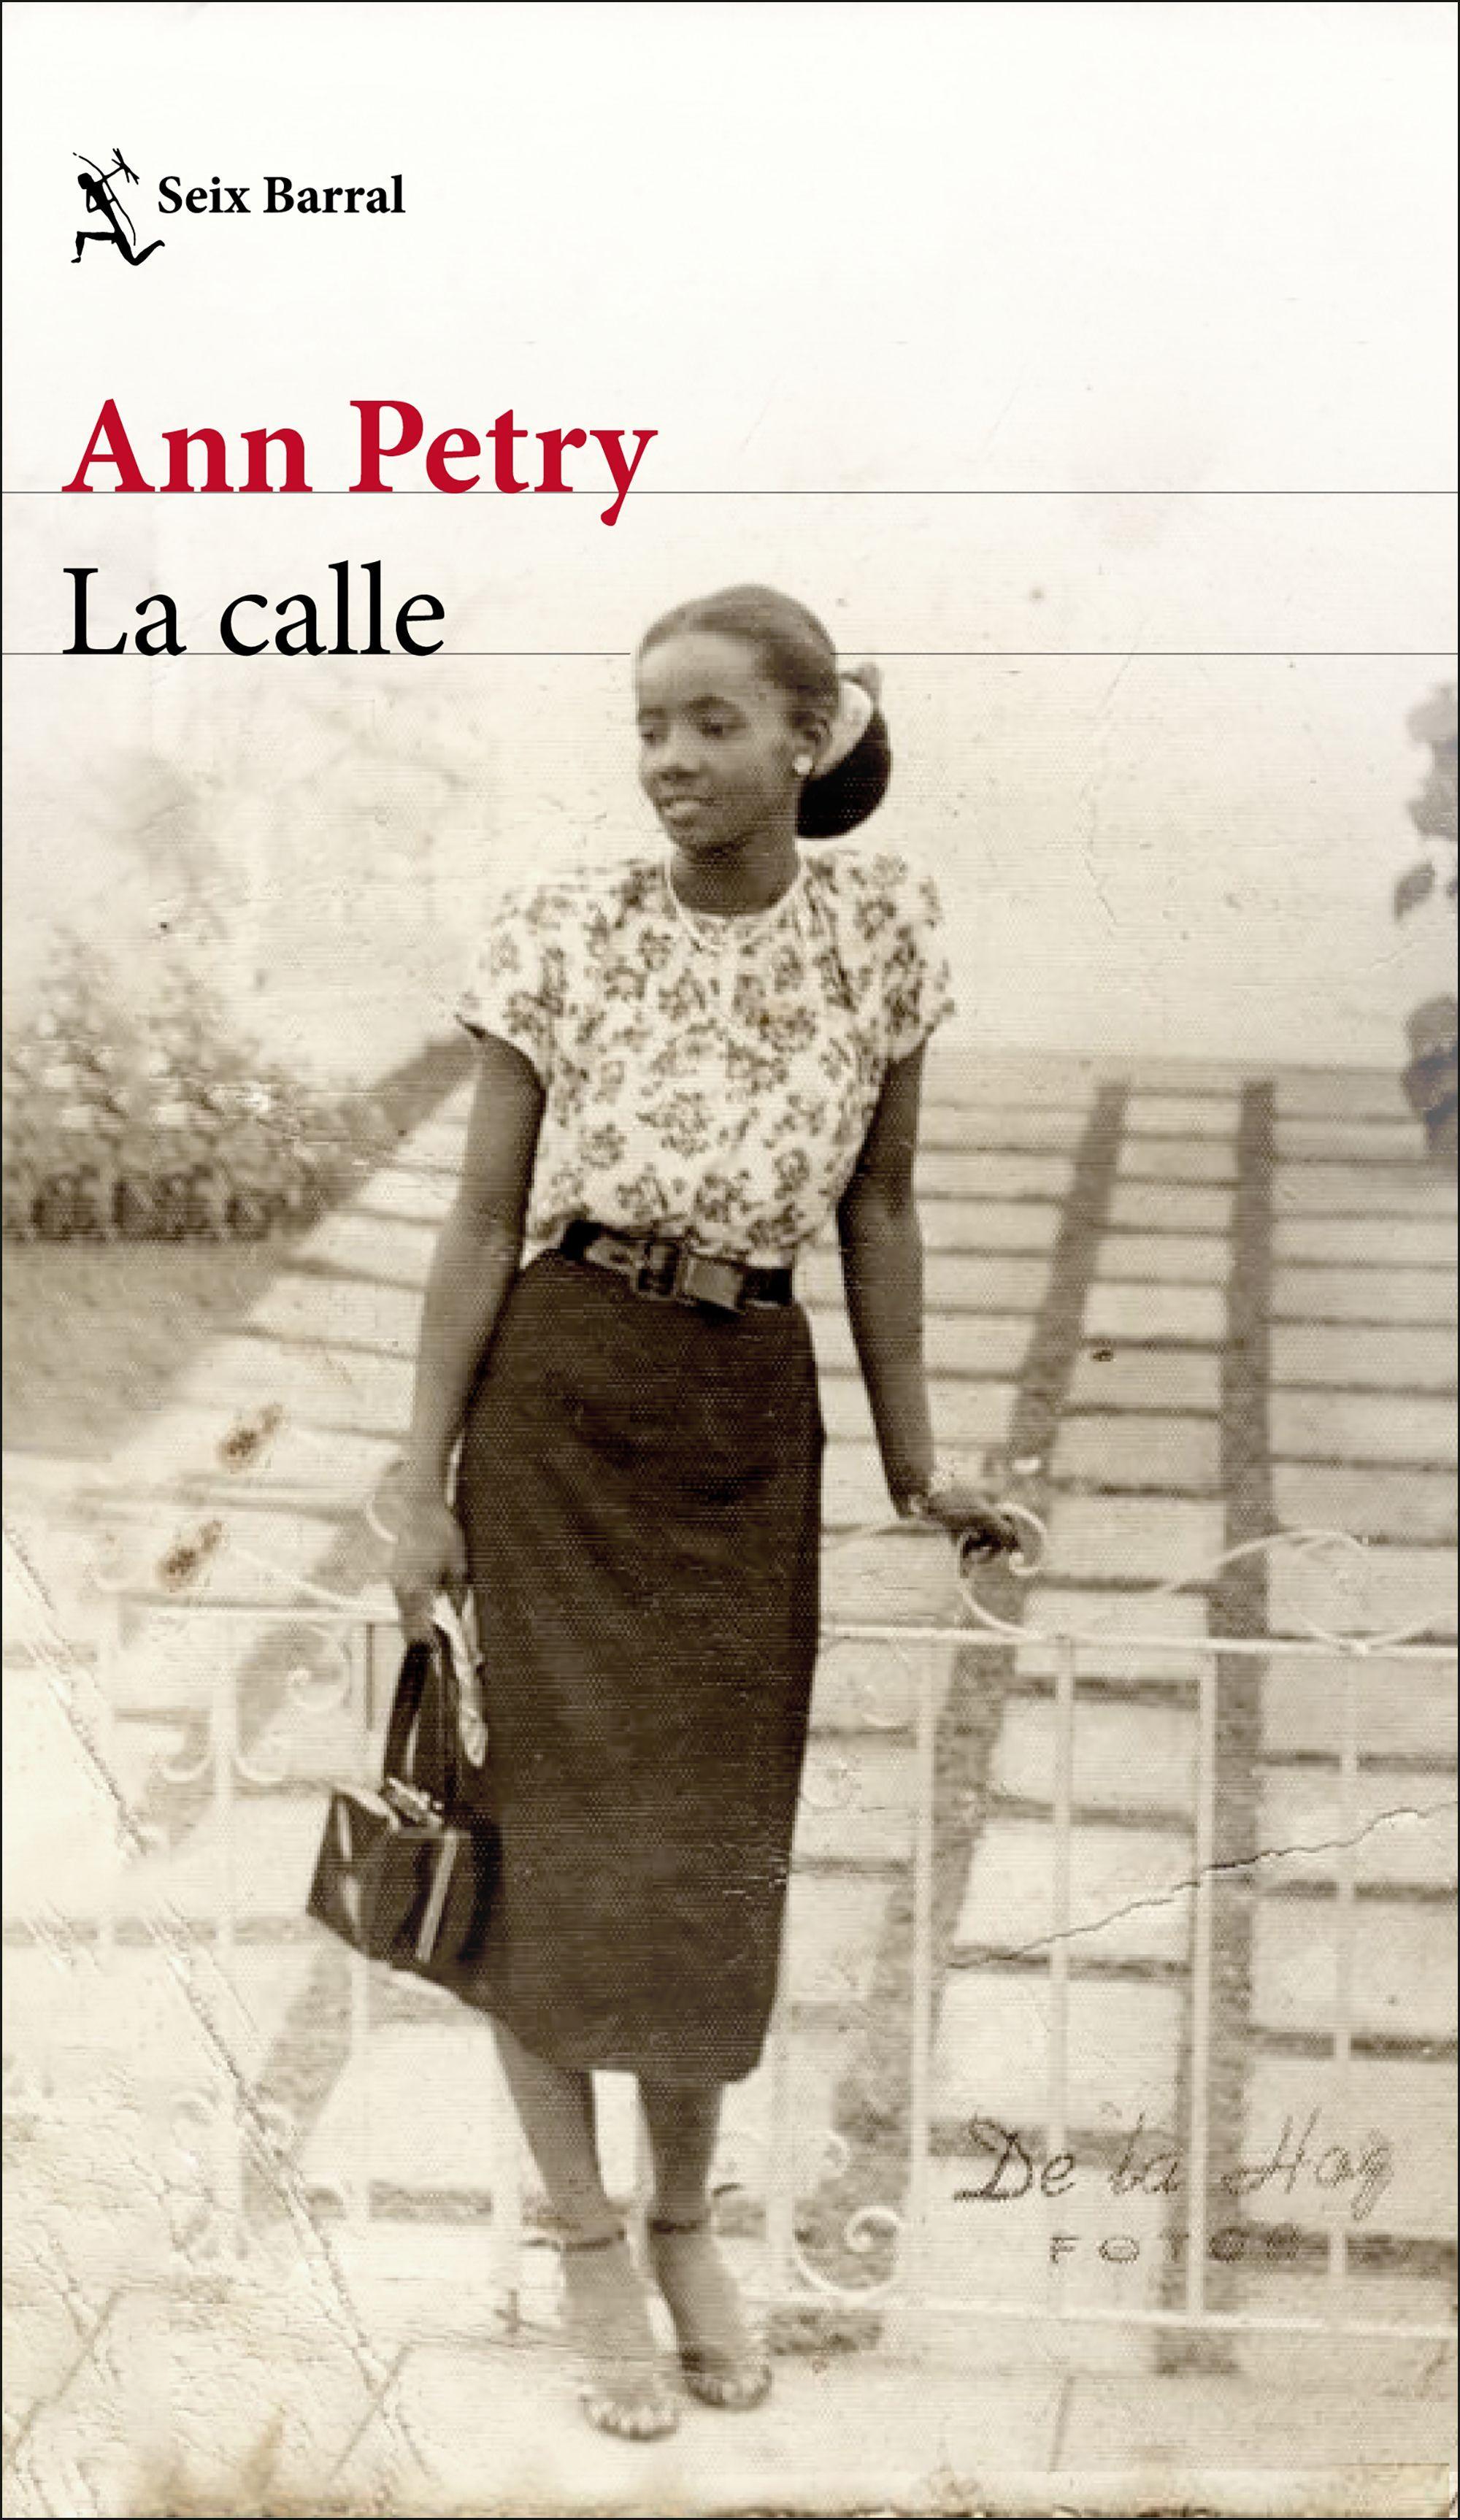 CALLE LA